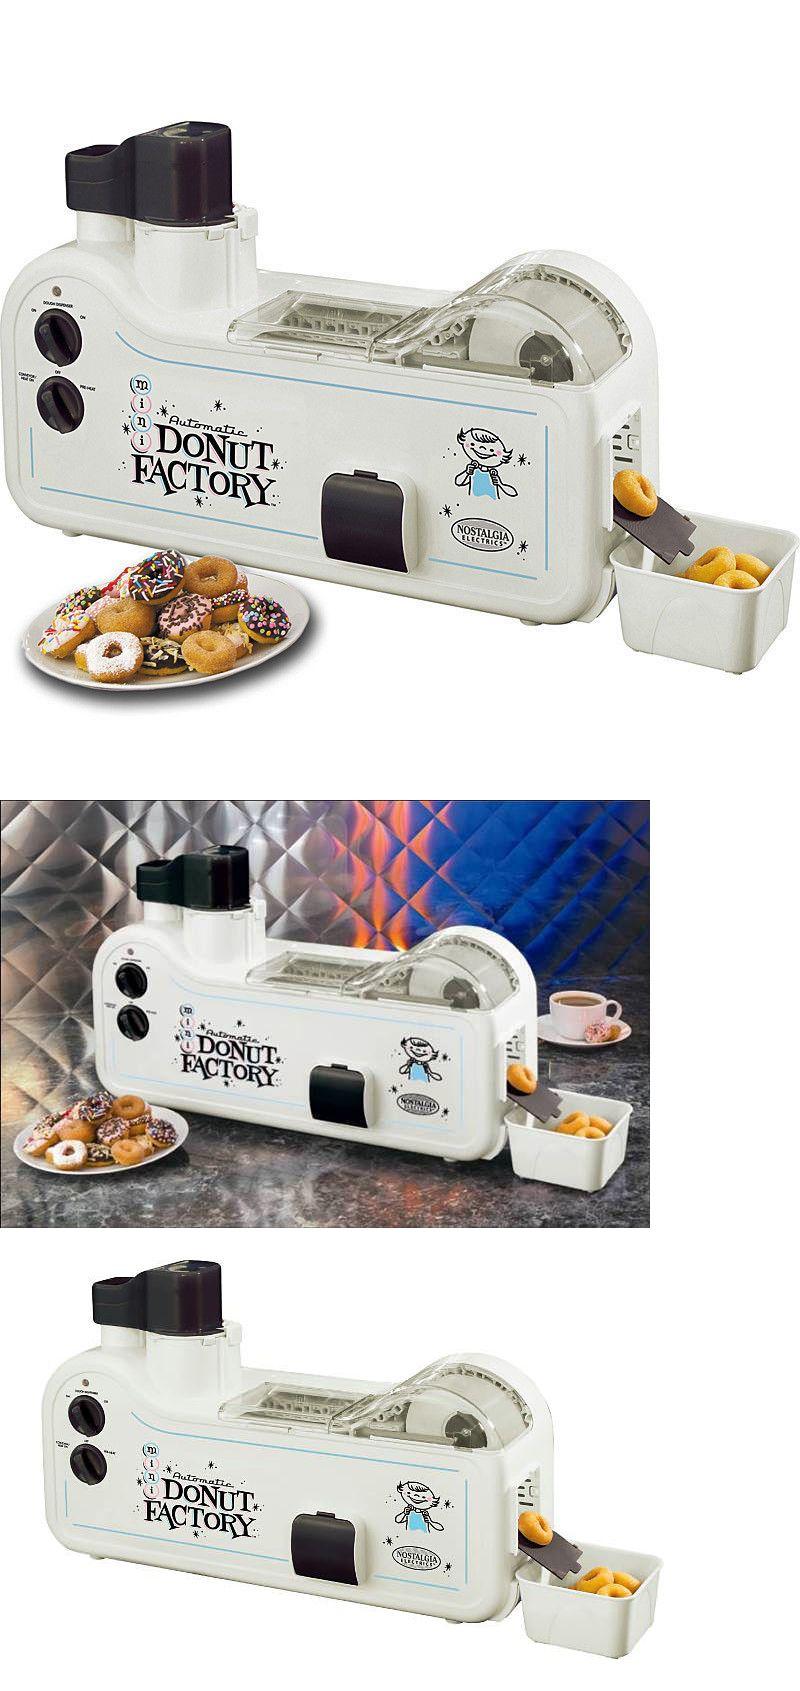 Other Small Kitchen Appliances 20685: Mini Donut Maker Factory Nostalgia Electrics Automatic Doughnut Machine Mdf-200 -> BUY IT NOW ONLY: $192.09 on eBay!